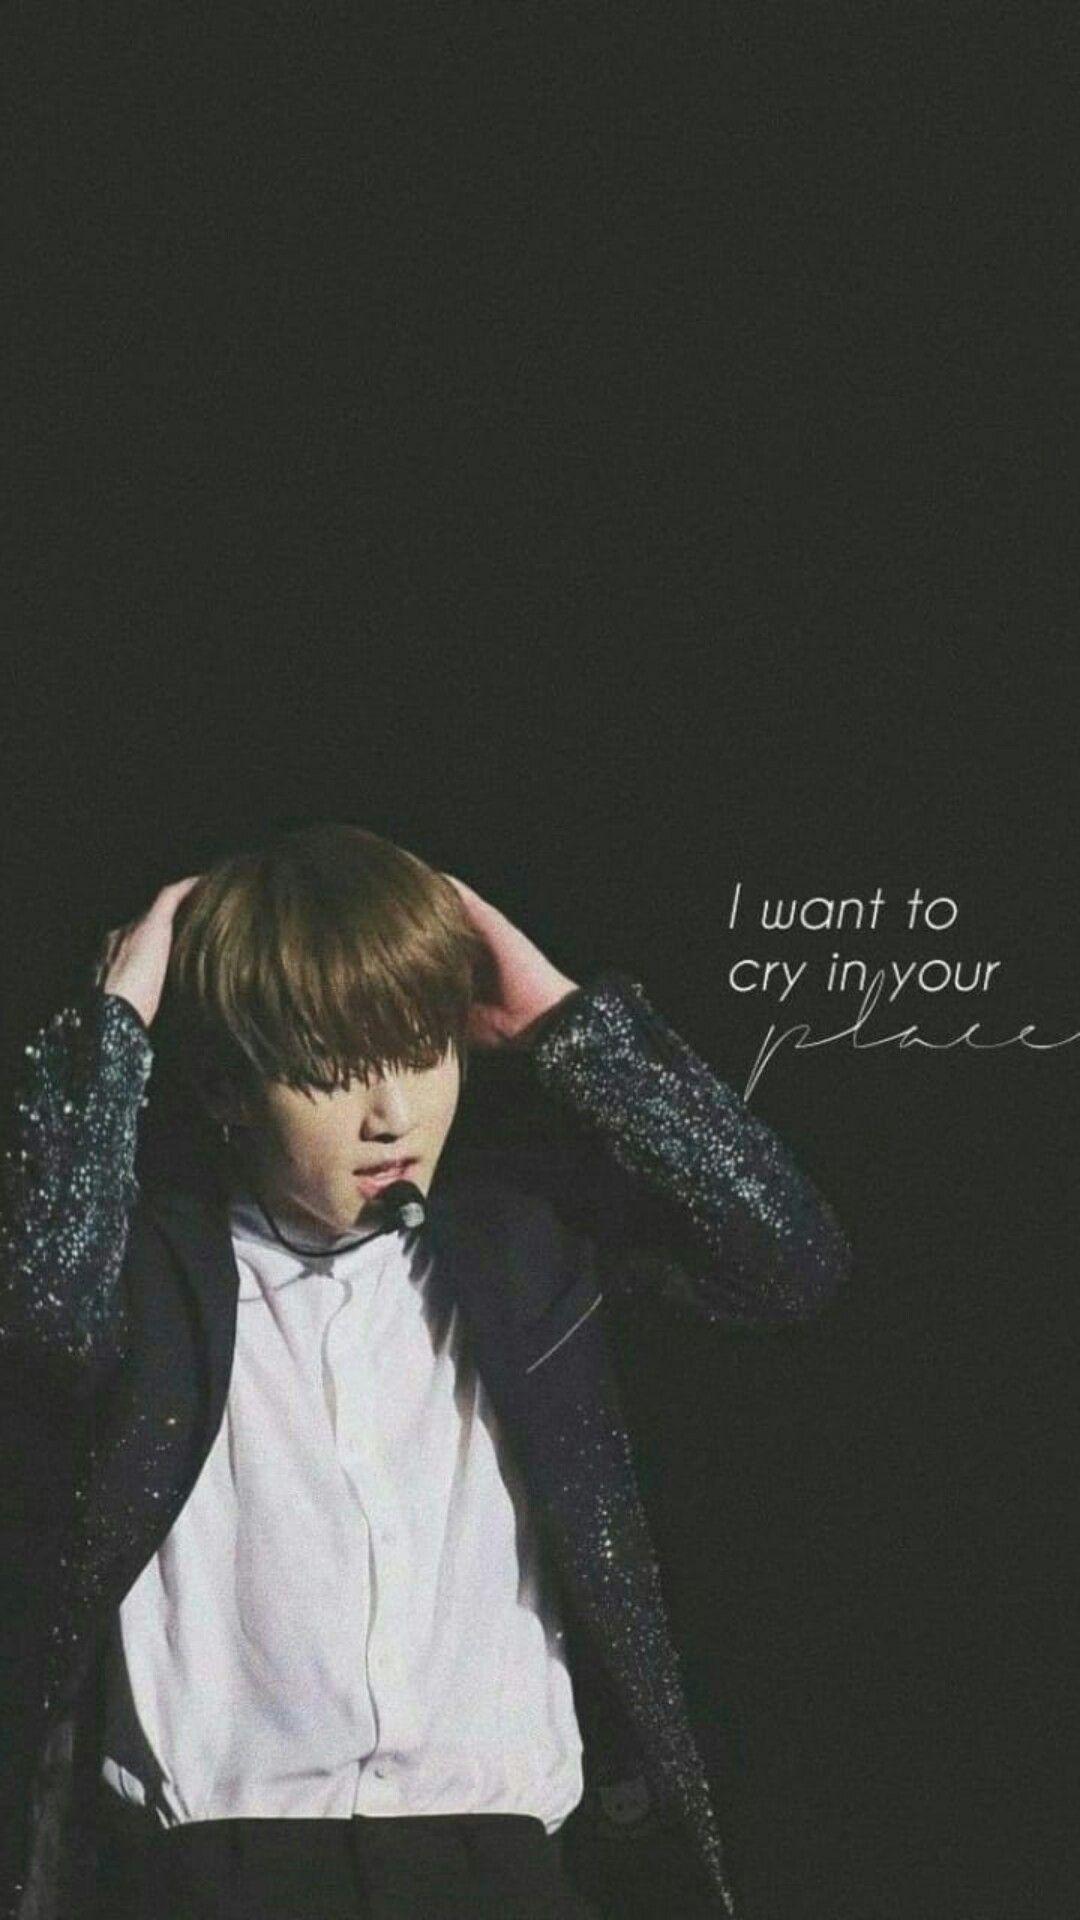 I Want To Cry In Your Place Bts Wallpaper Bts Qoutes Bts Jungkook Bts Lyrics Quotes Bts sad quotes wallpaper